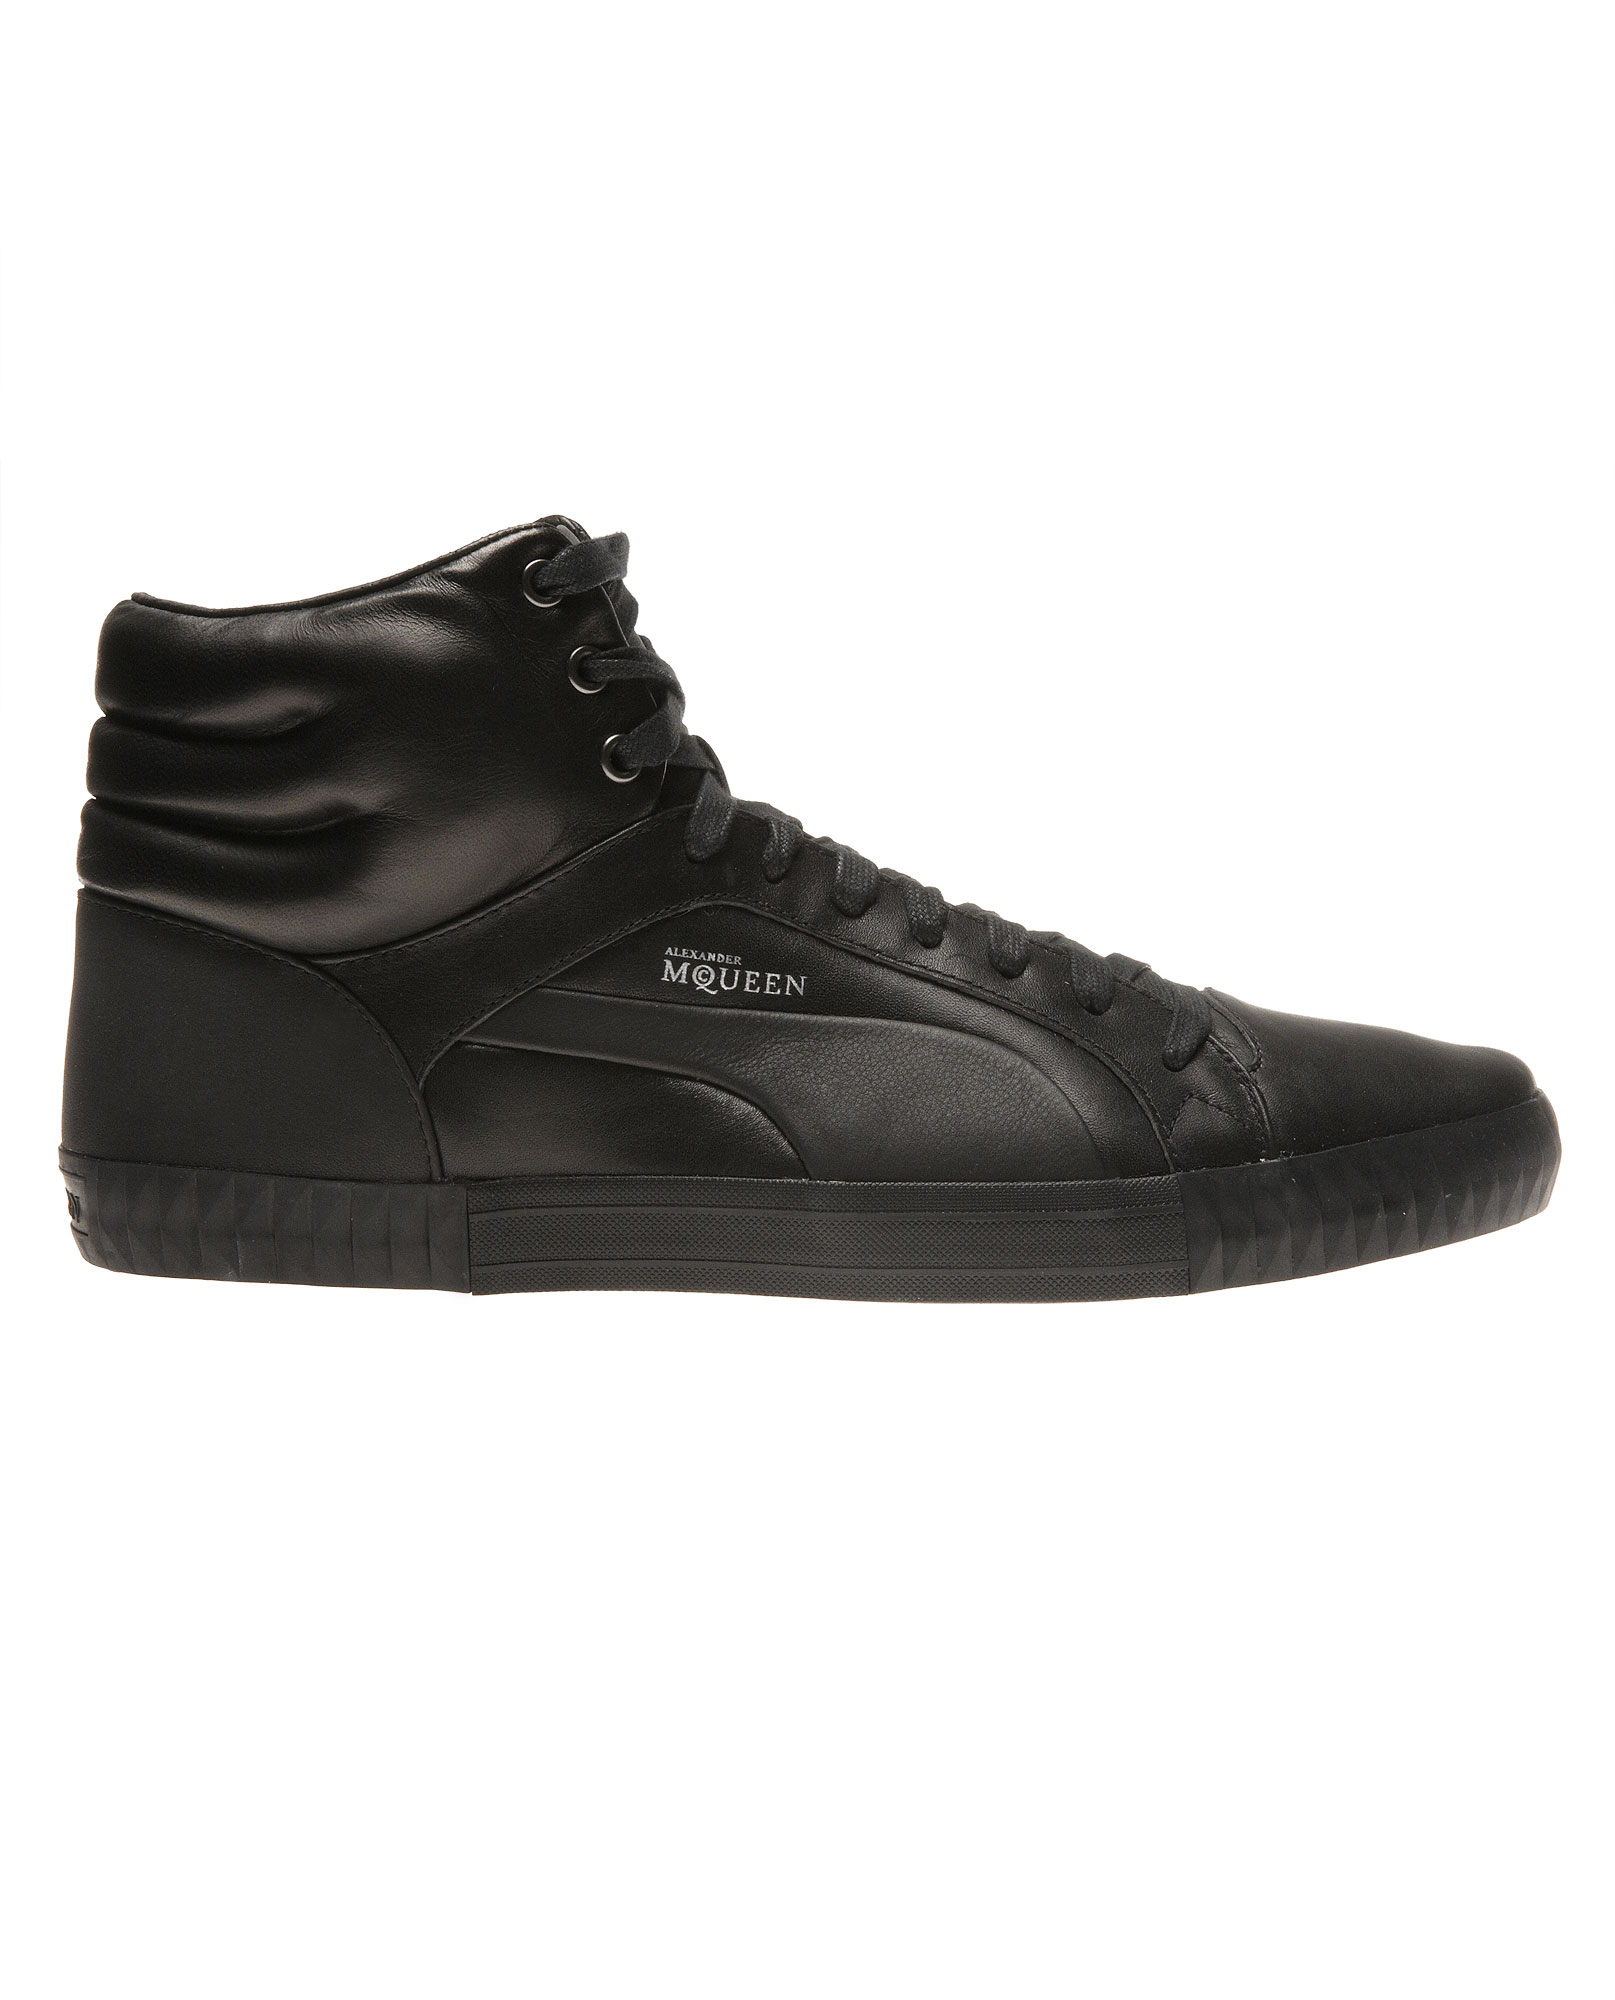 Alexander McQueen X Puma Sculpted Leather Hi-tops in Black for Men ... 5a02550817b3